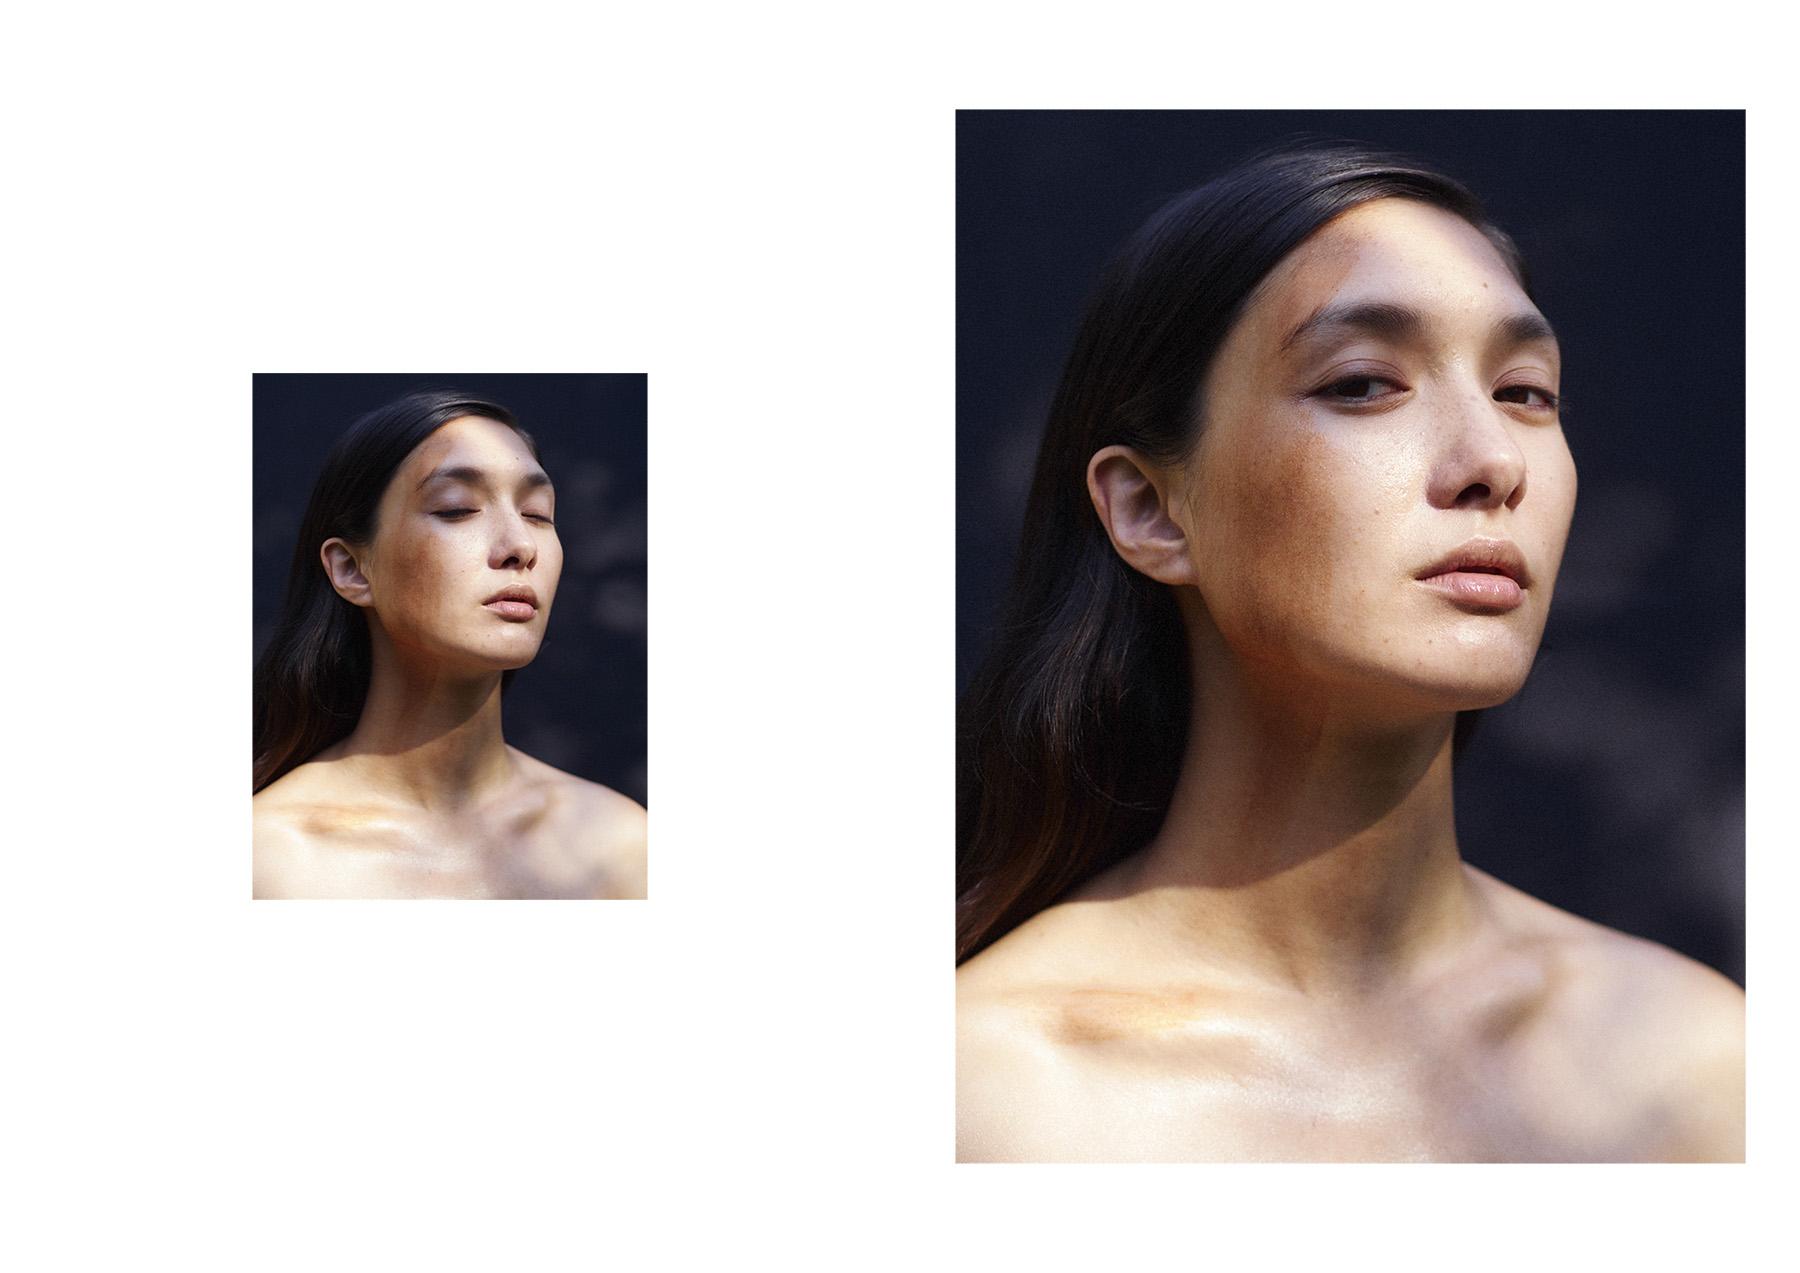 016-icon-artist-management-Kristin-Vicari-Beauty-Untainted.jpg